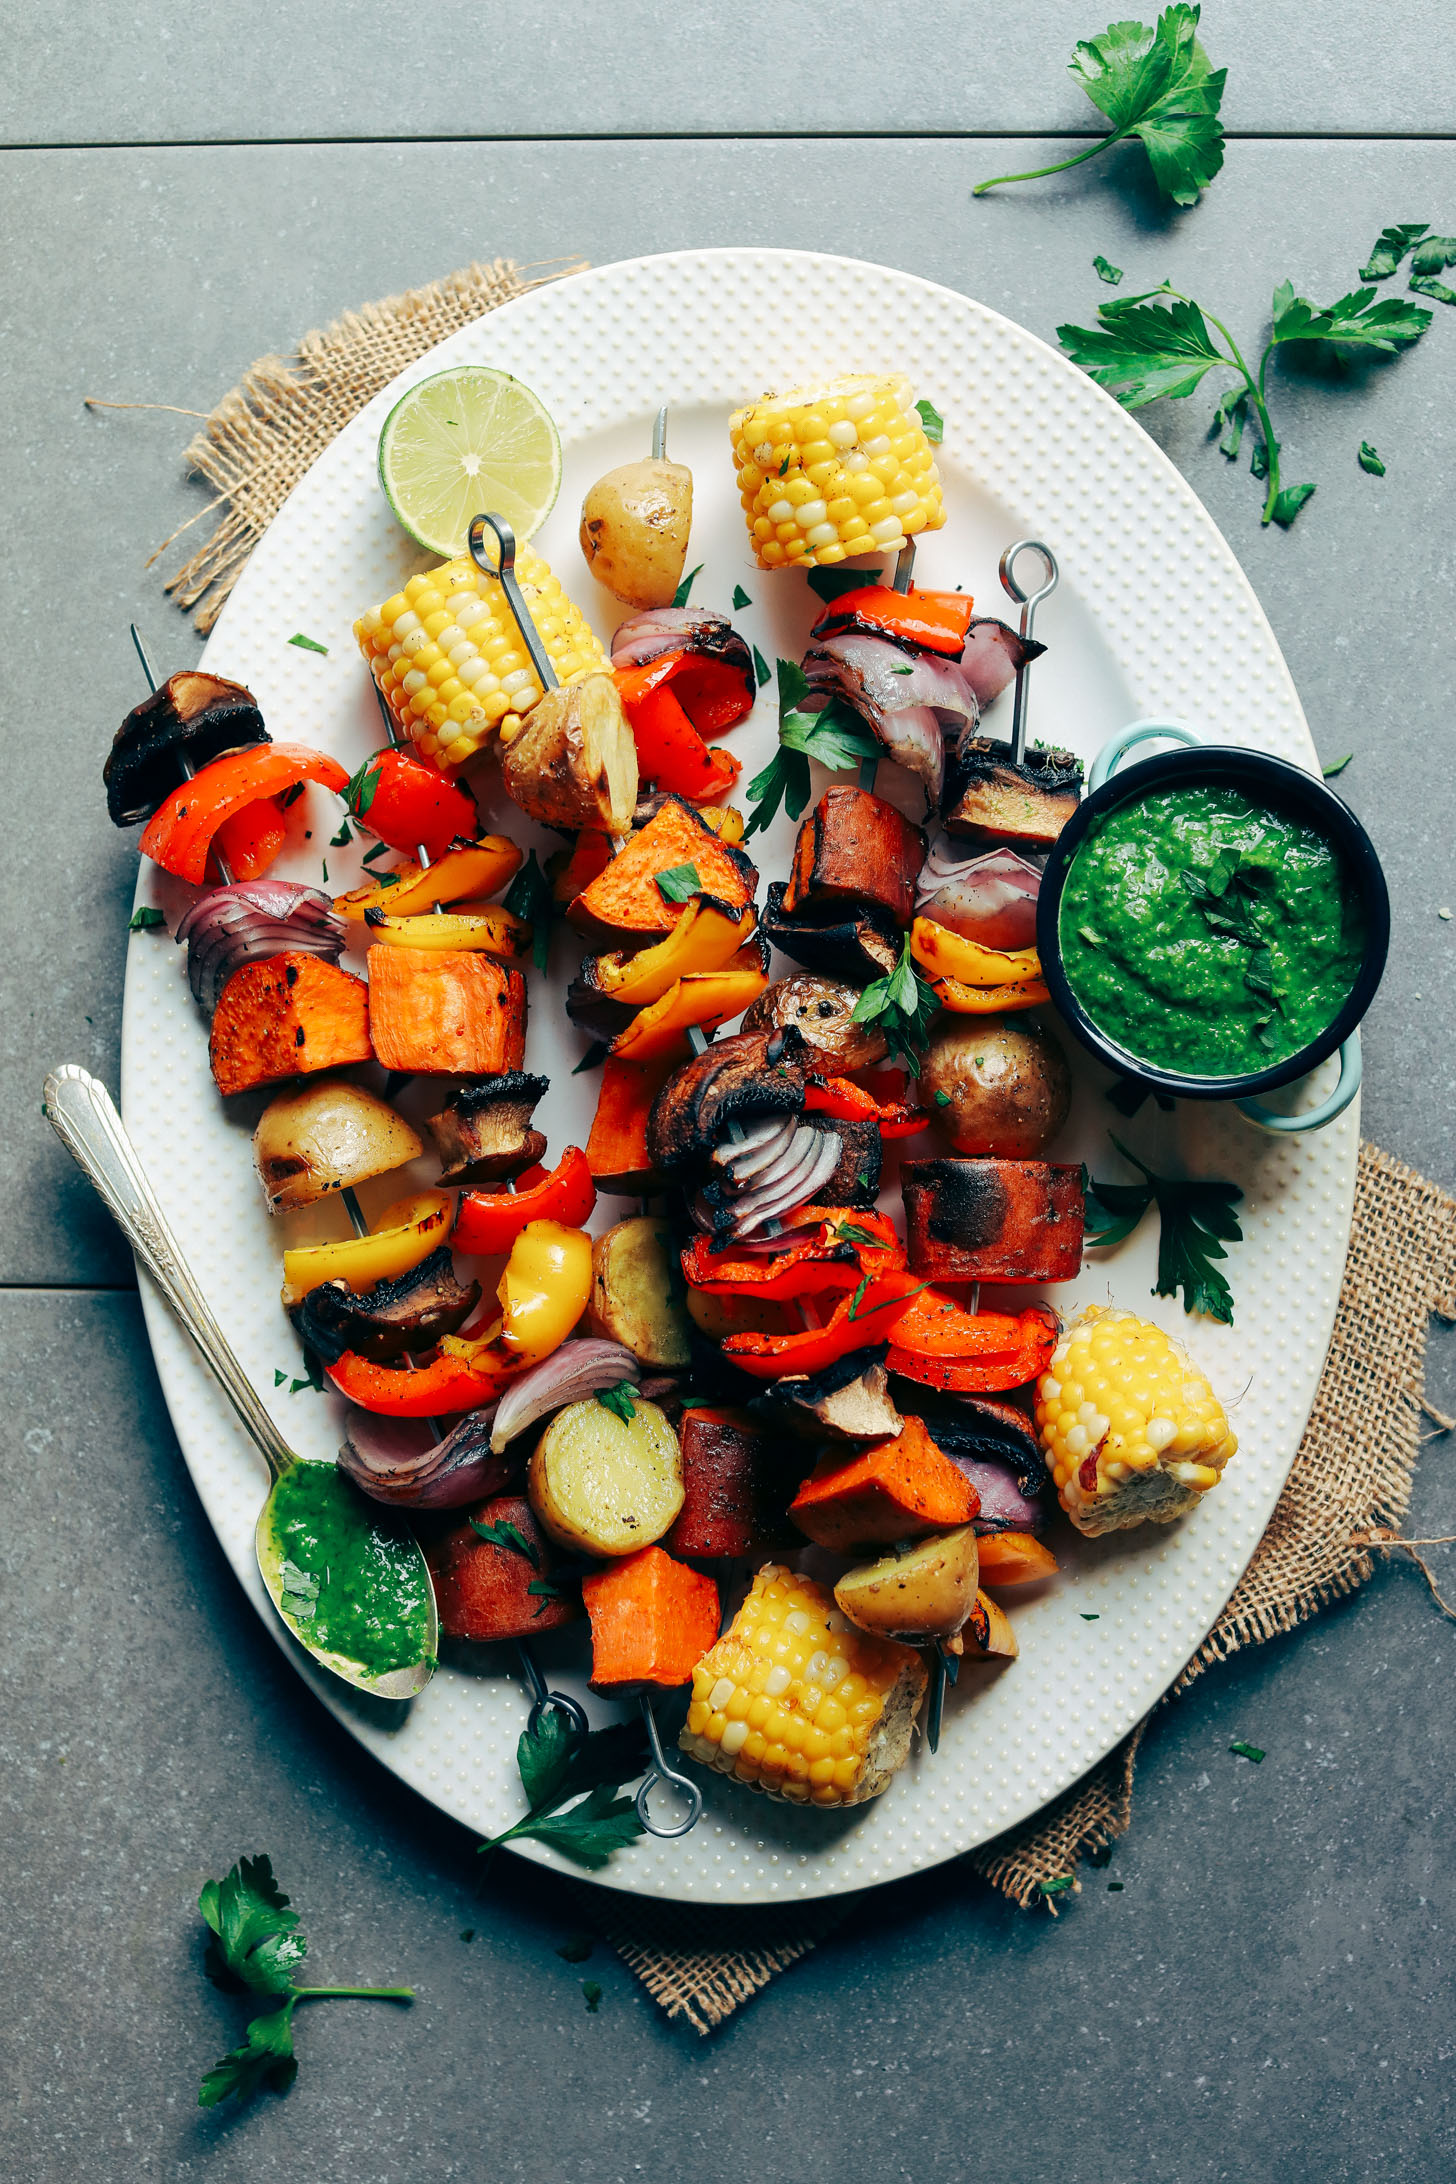 veggie skewers and chimchurri